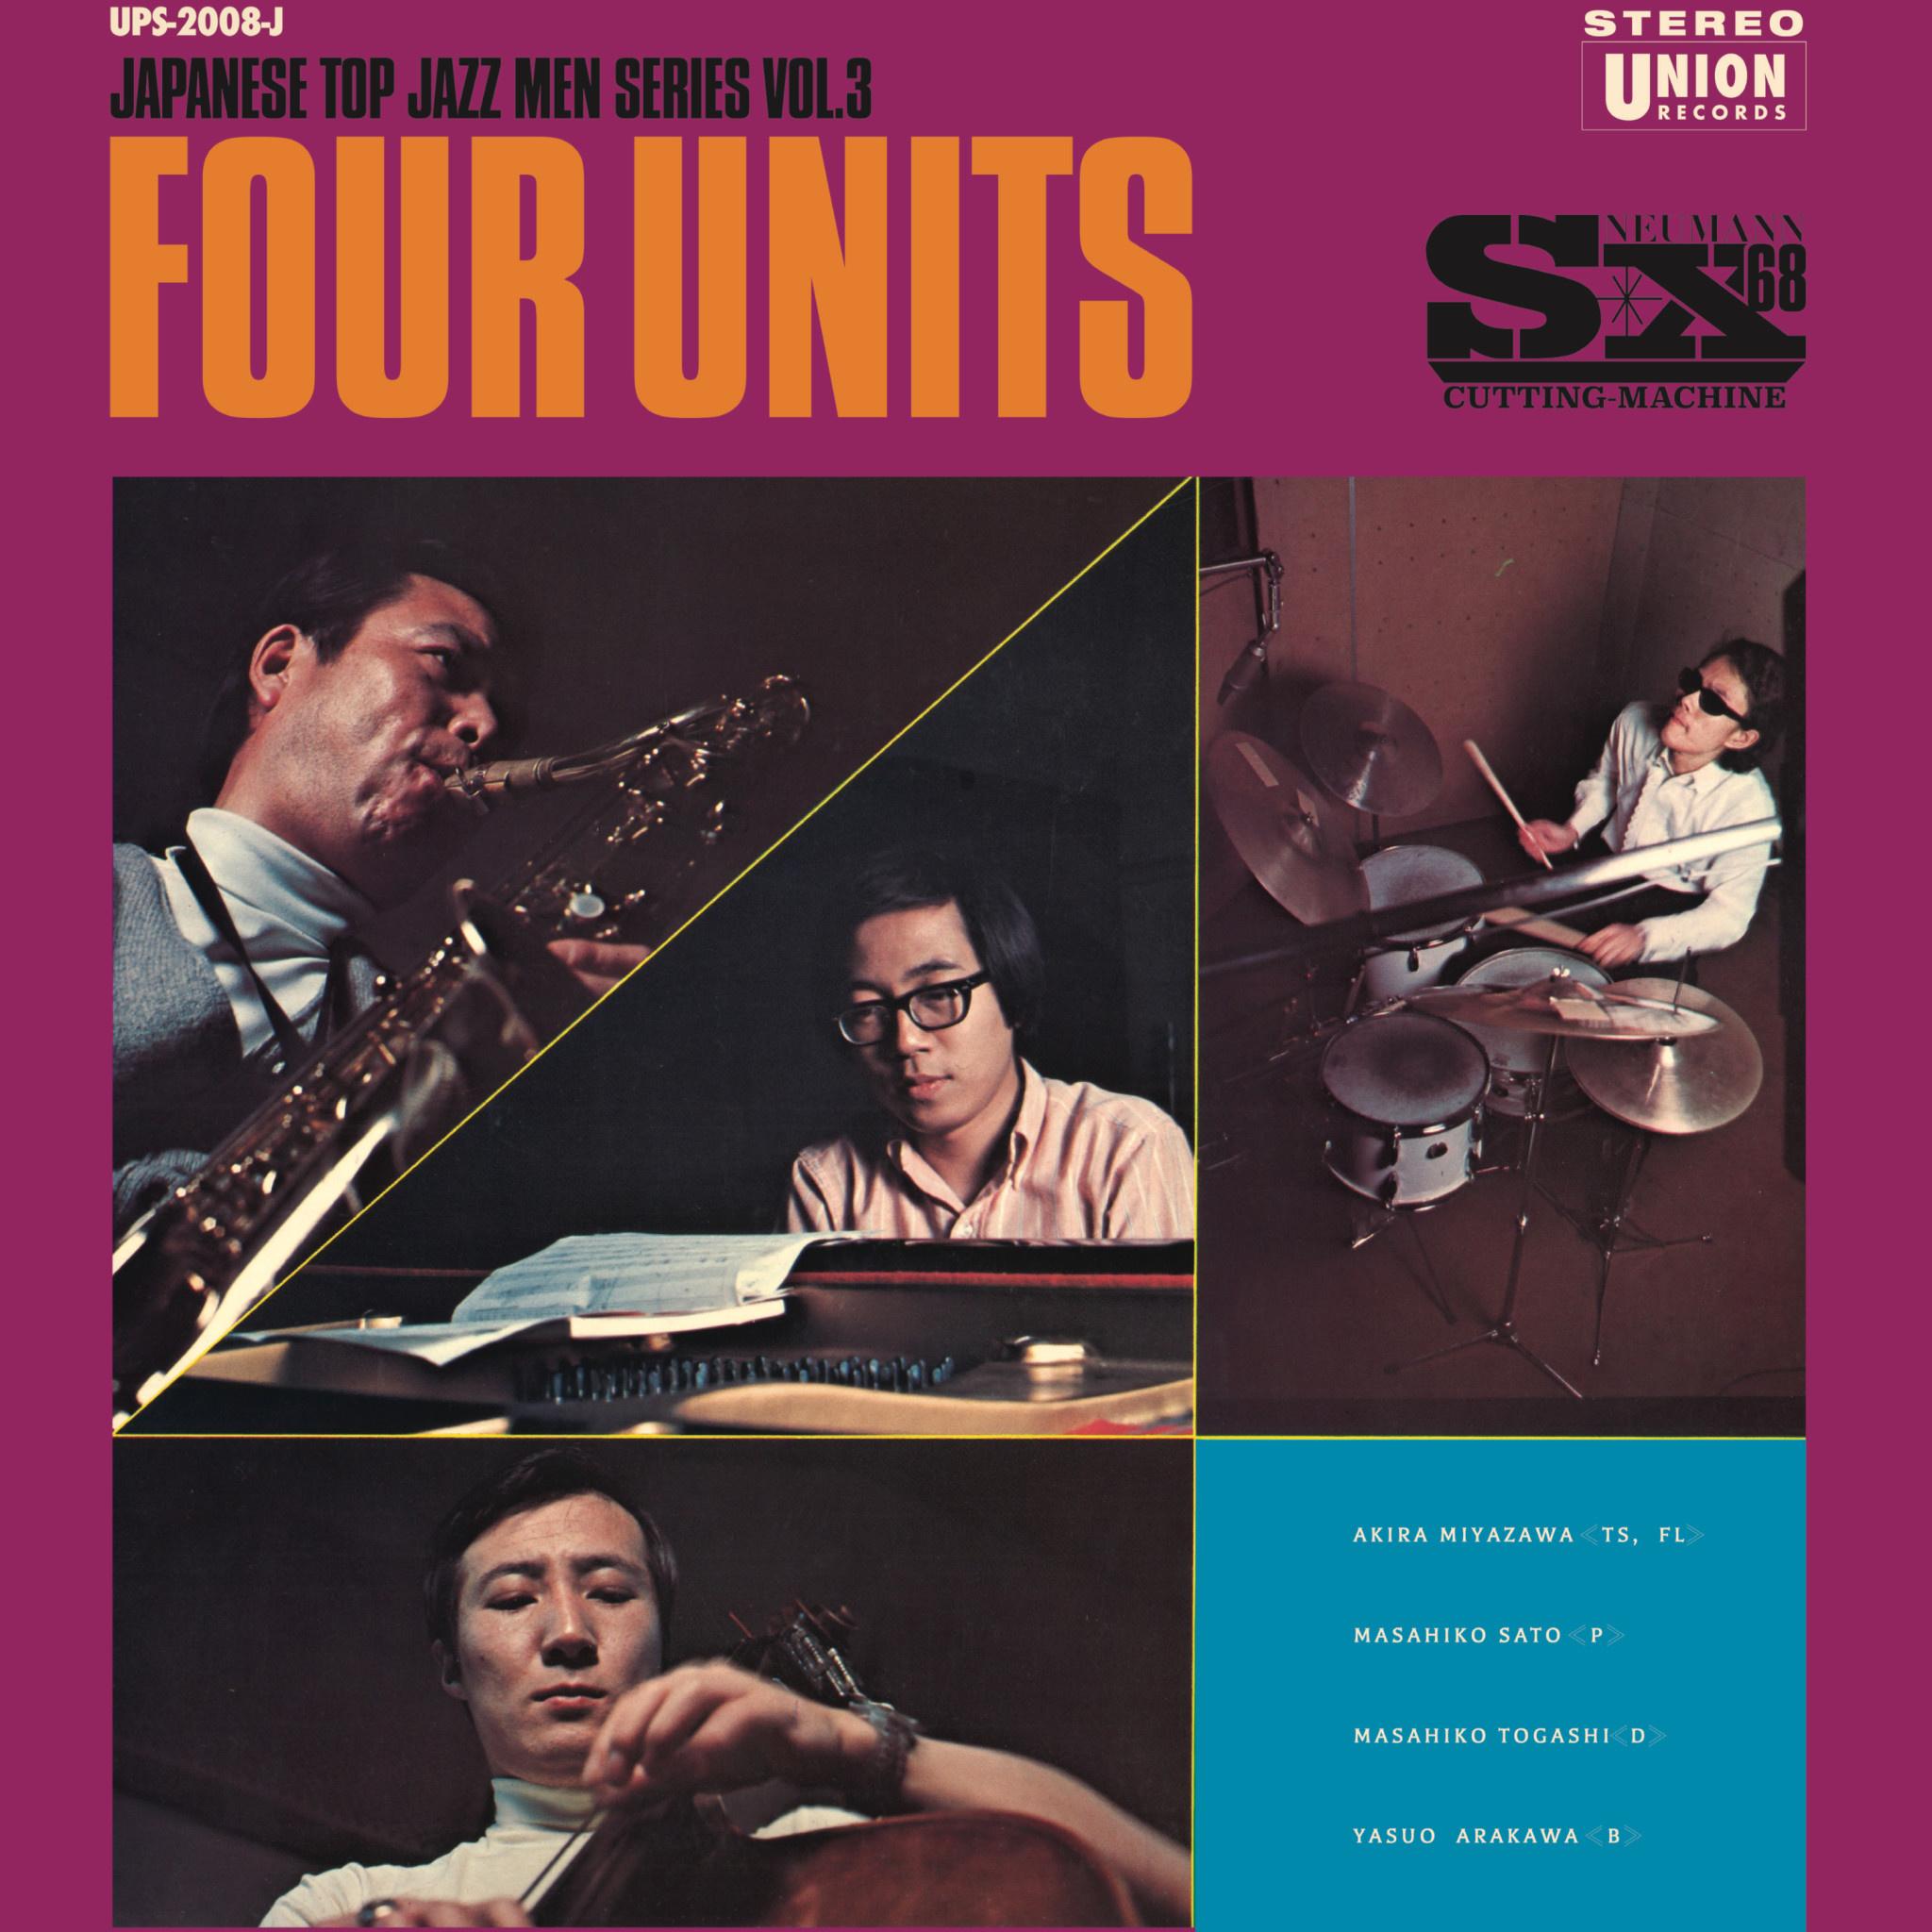 Le Tres Jazz Club Akira Miyazawa, Masahiko Sato, Masahiko Togashi & Yasuo Arakawa - Four Units - Japanese Jazz Men Series Vol. 3